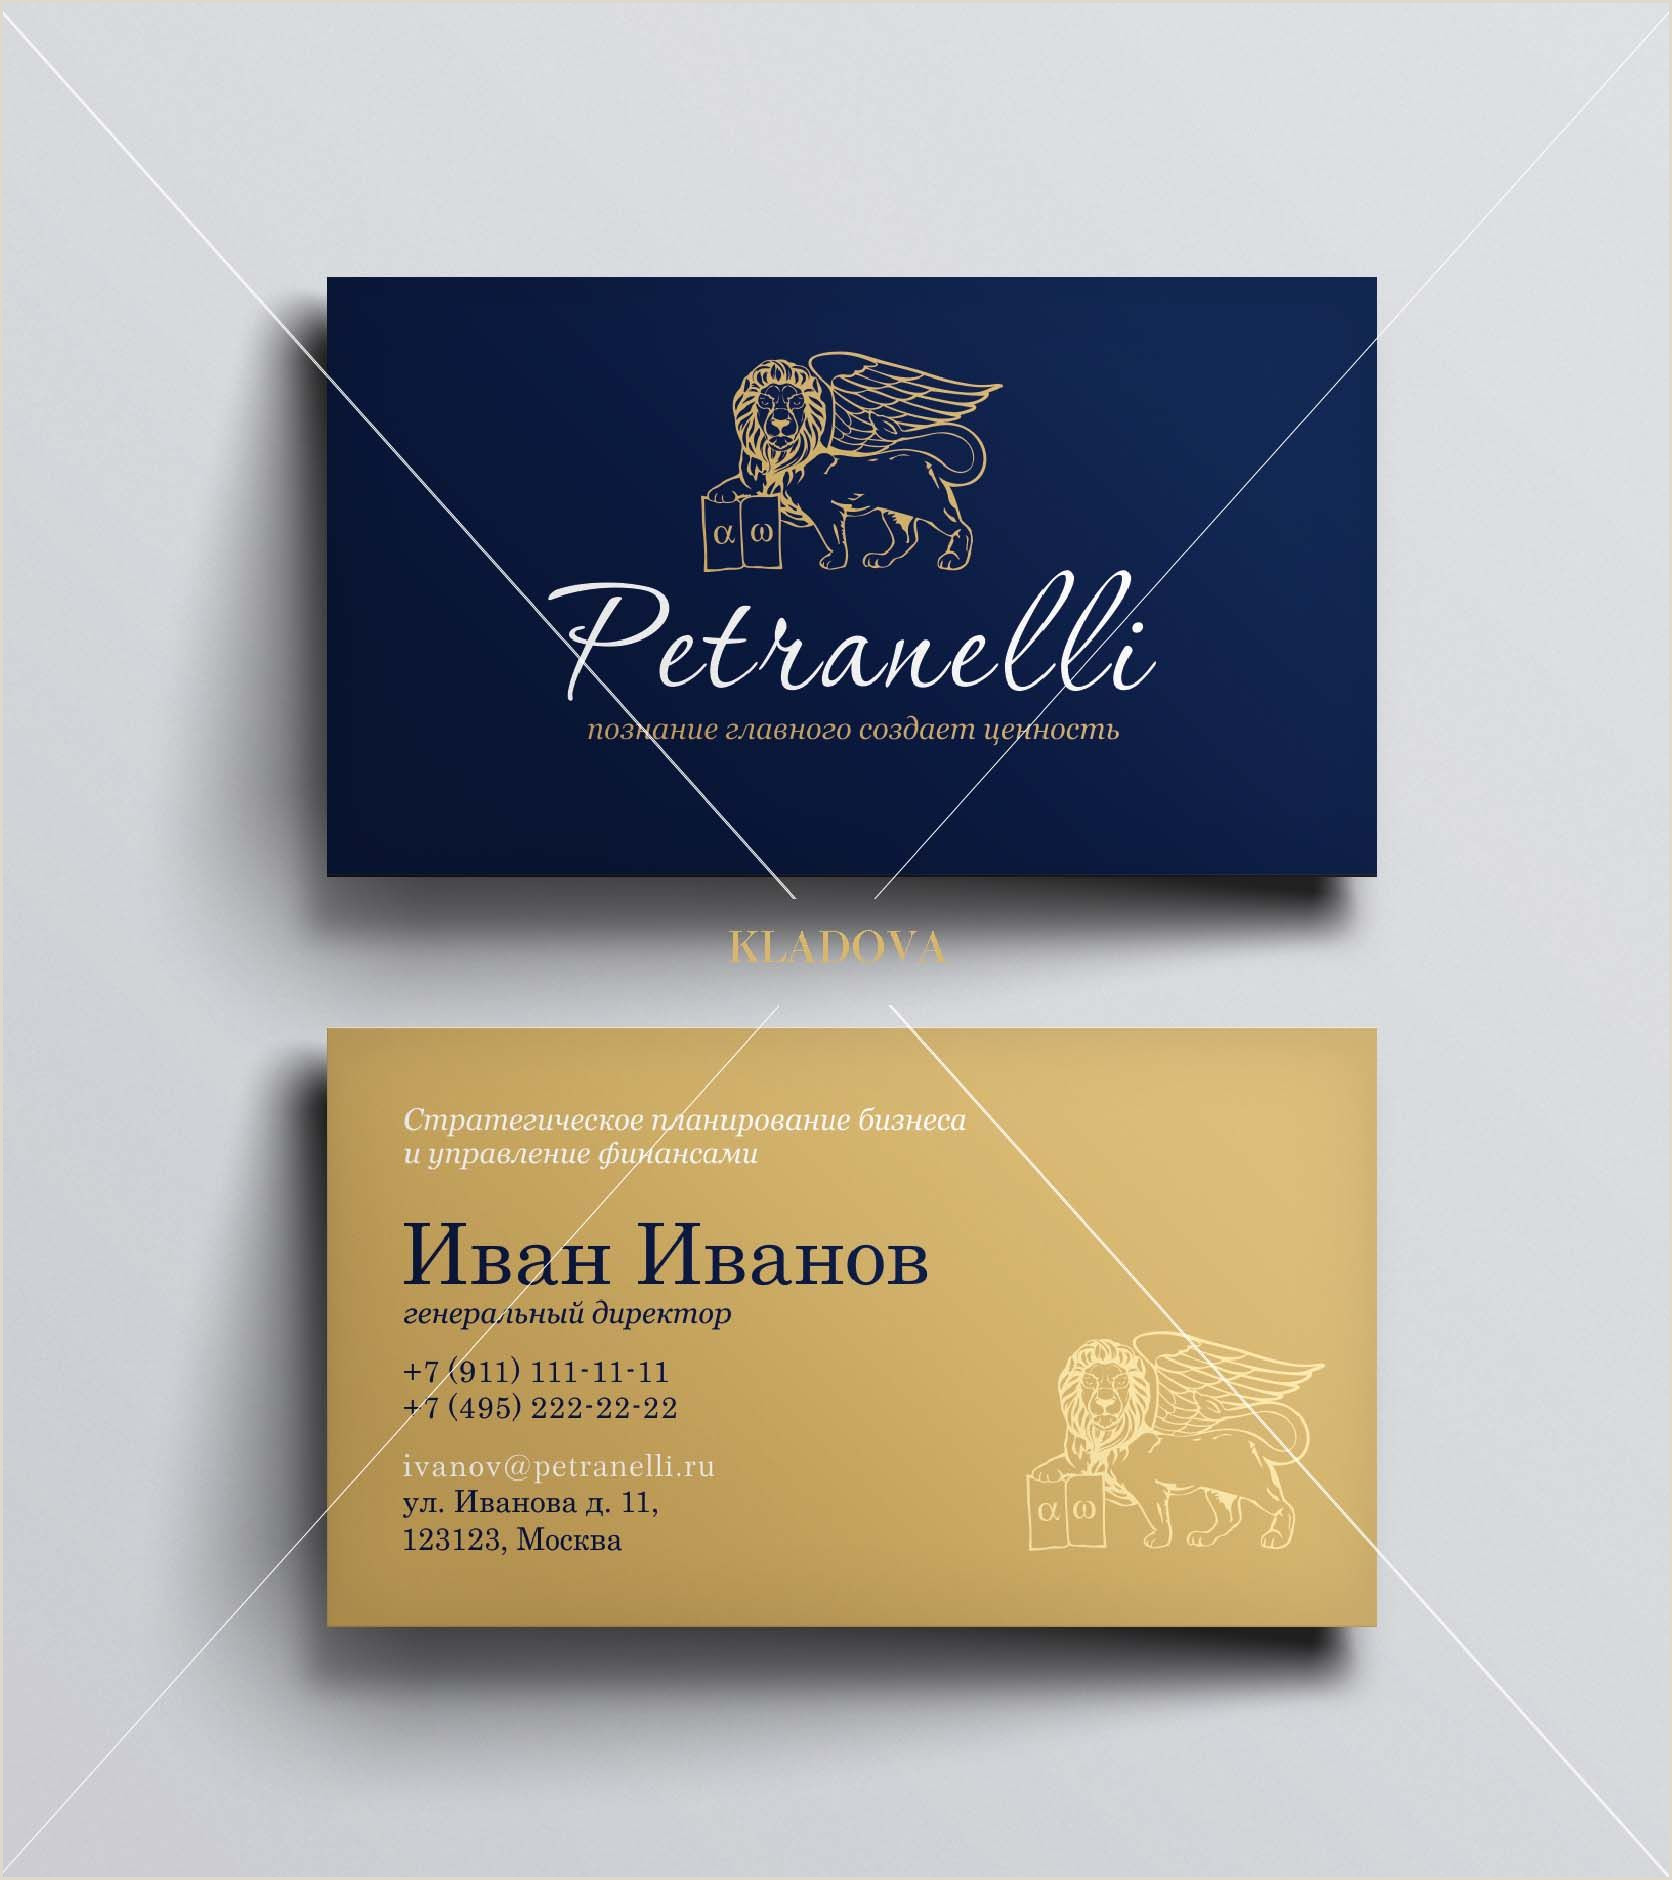 Personal Cards Designs визитка Visit Card Design дизайн Business Татьяна